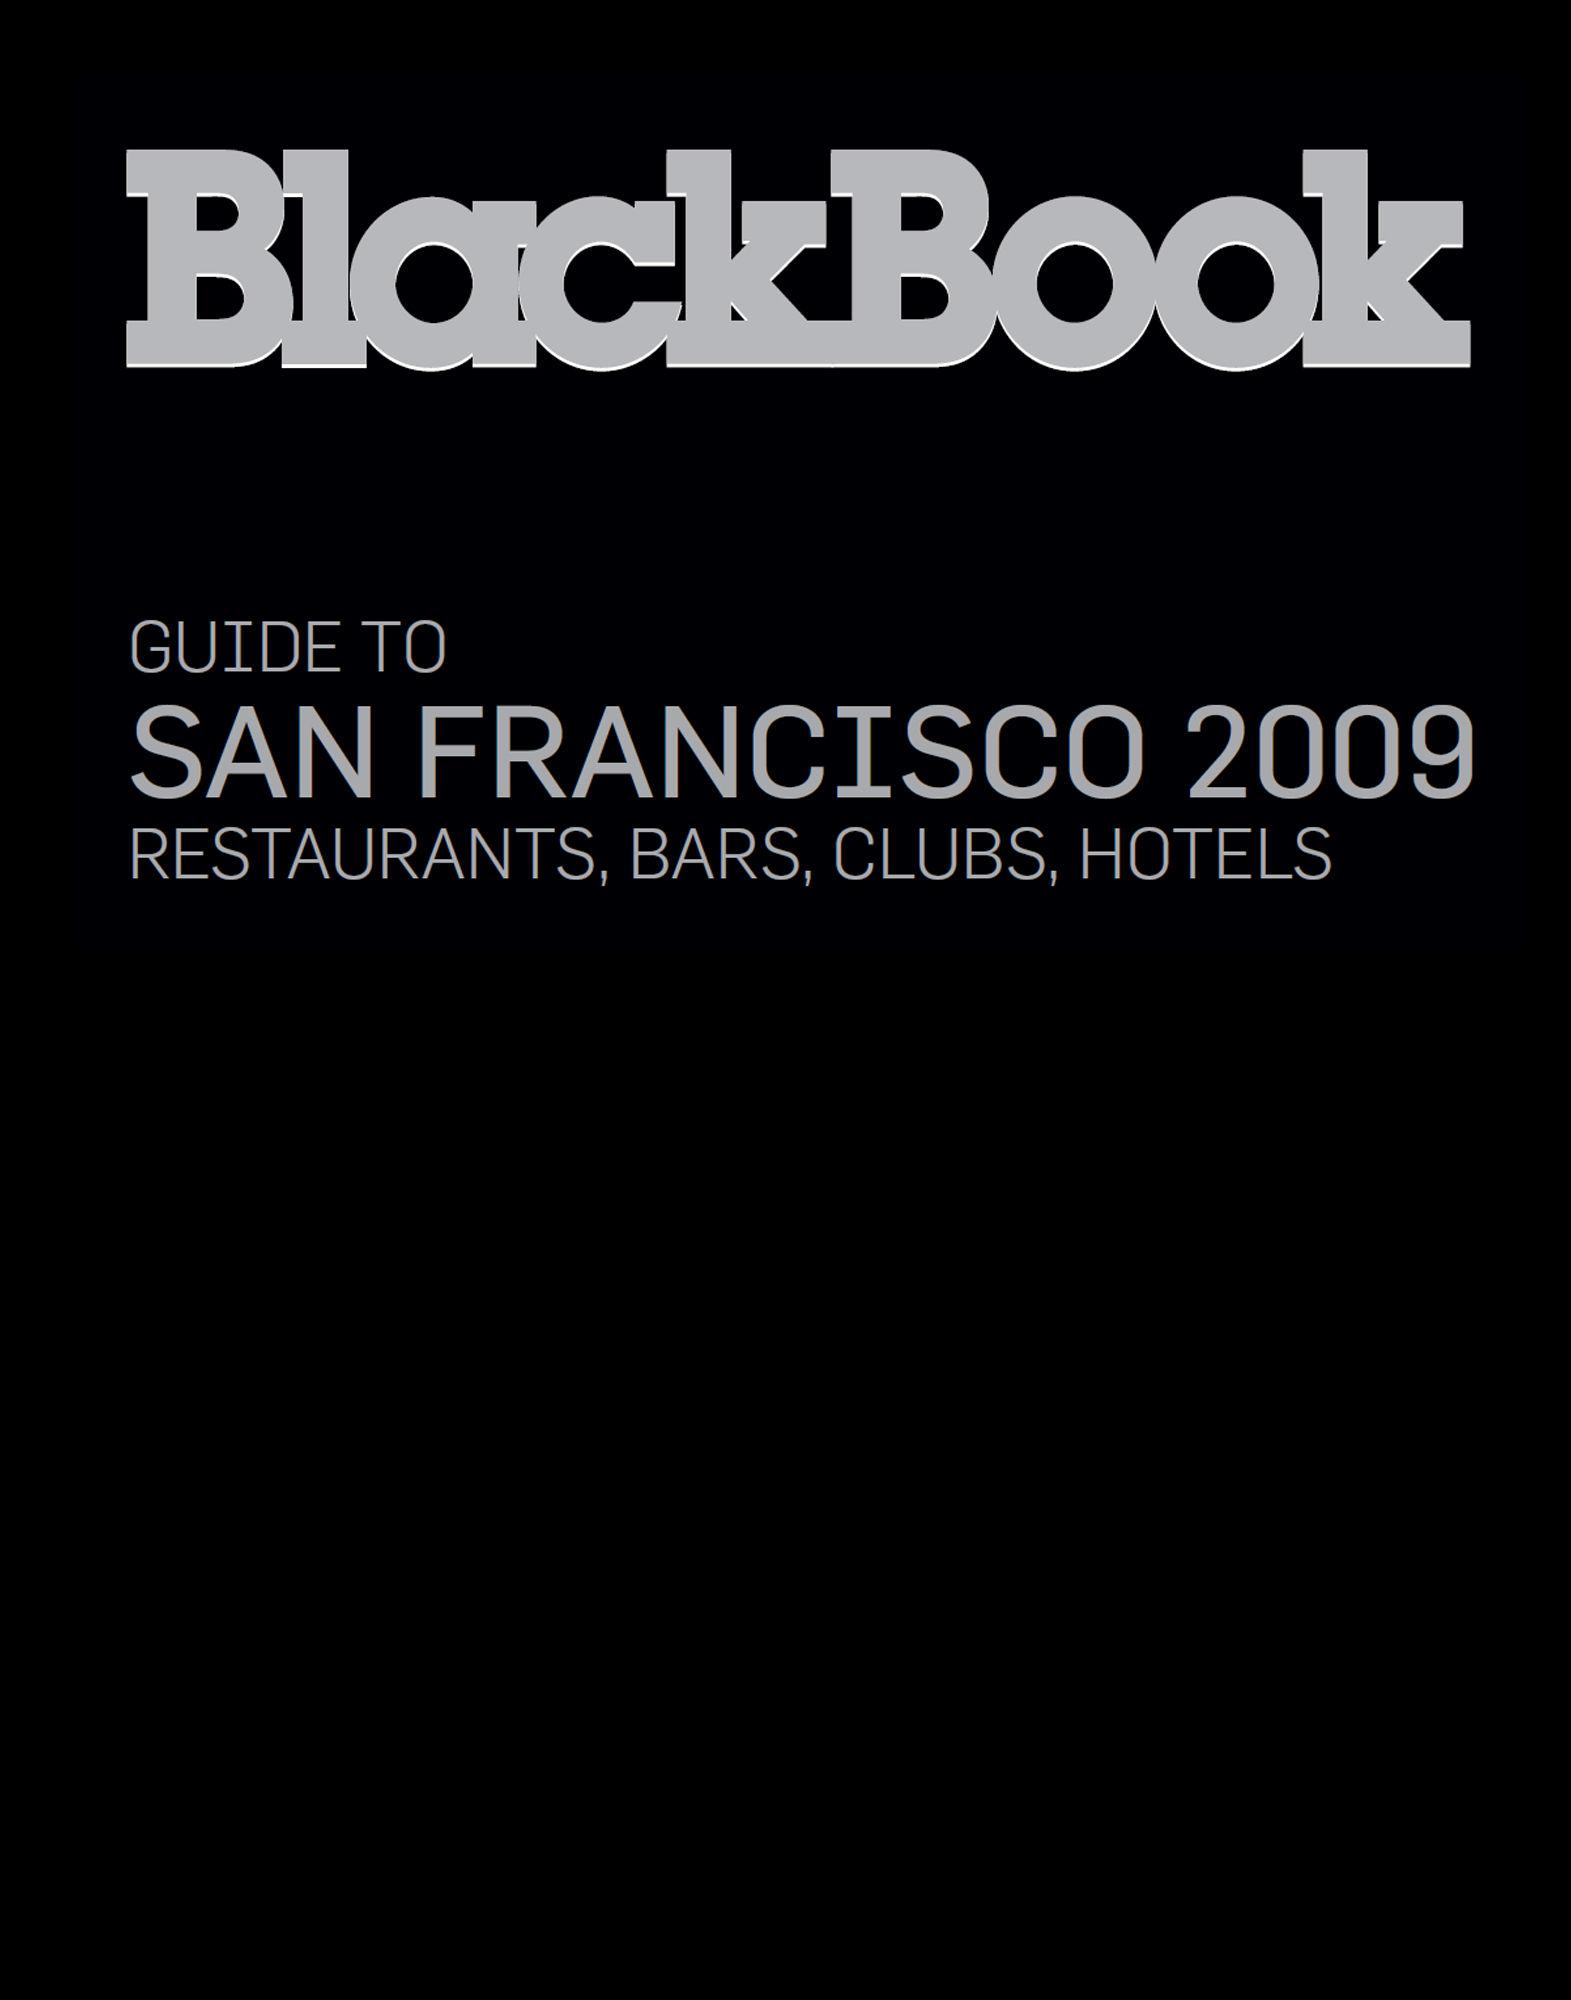 BLACKBOOK GUIDE LIFESTYLE  Item 56000503 1